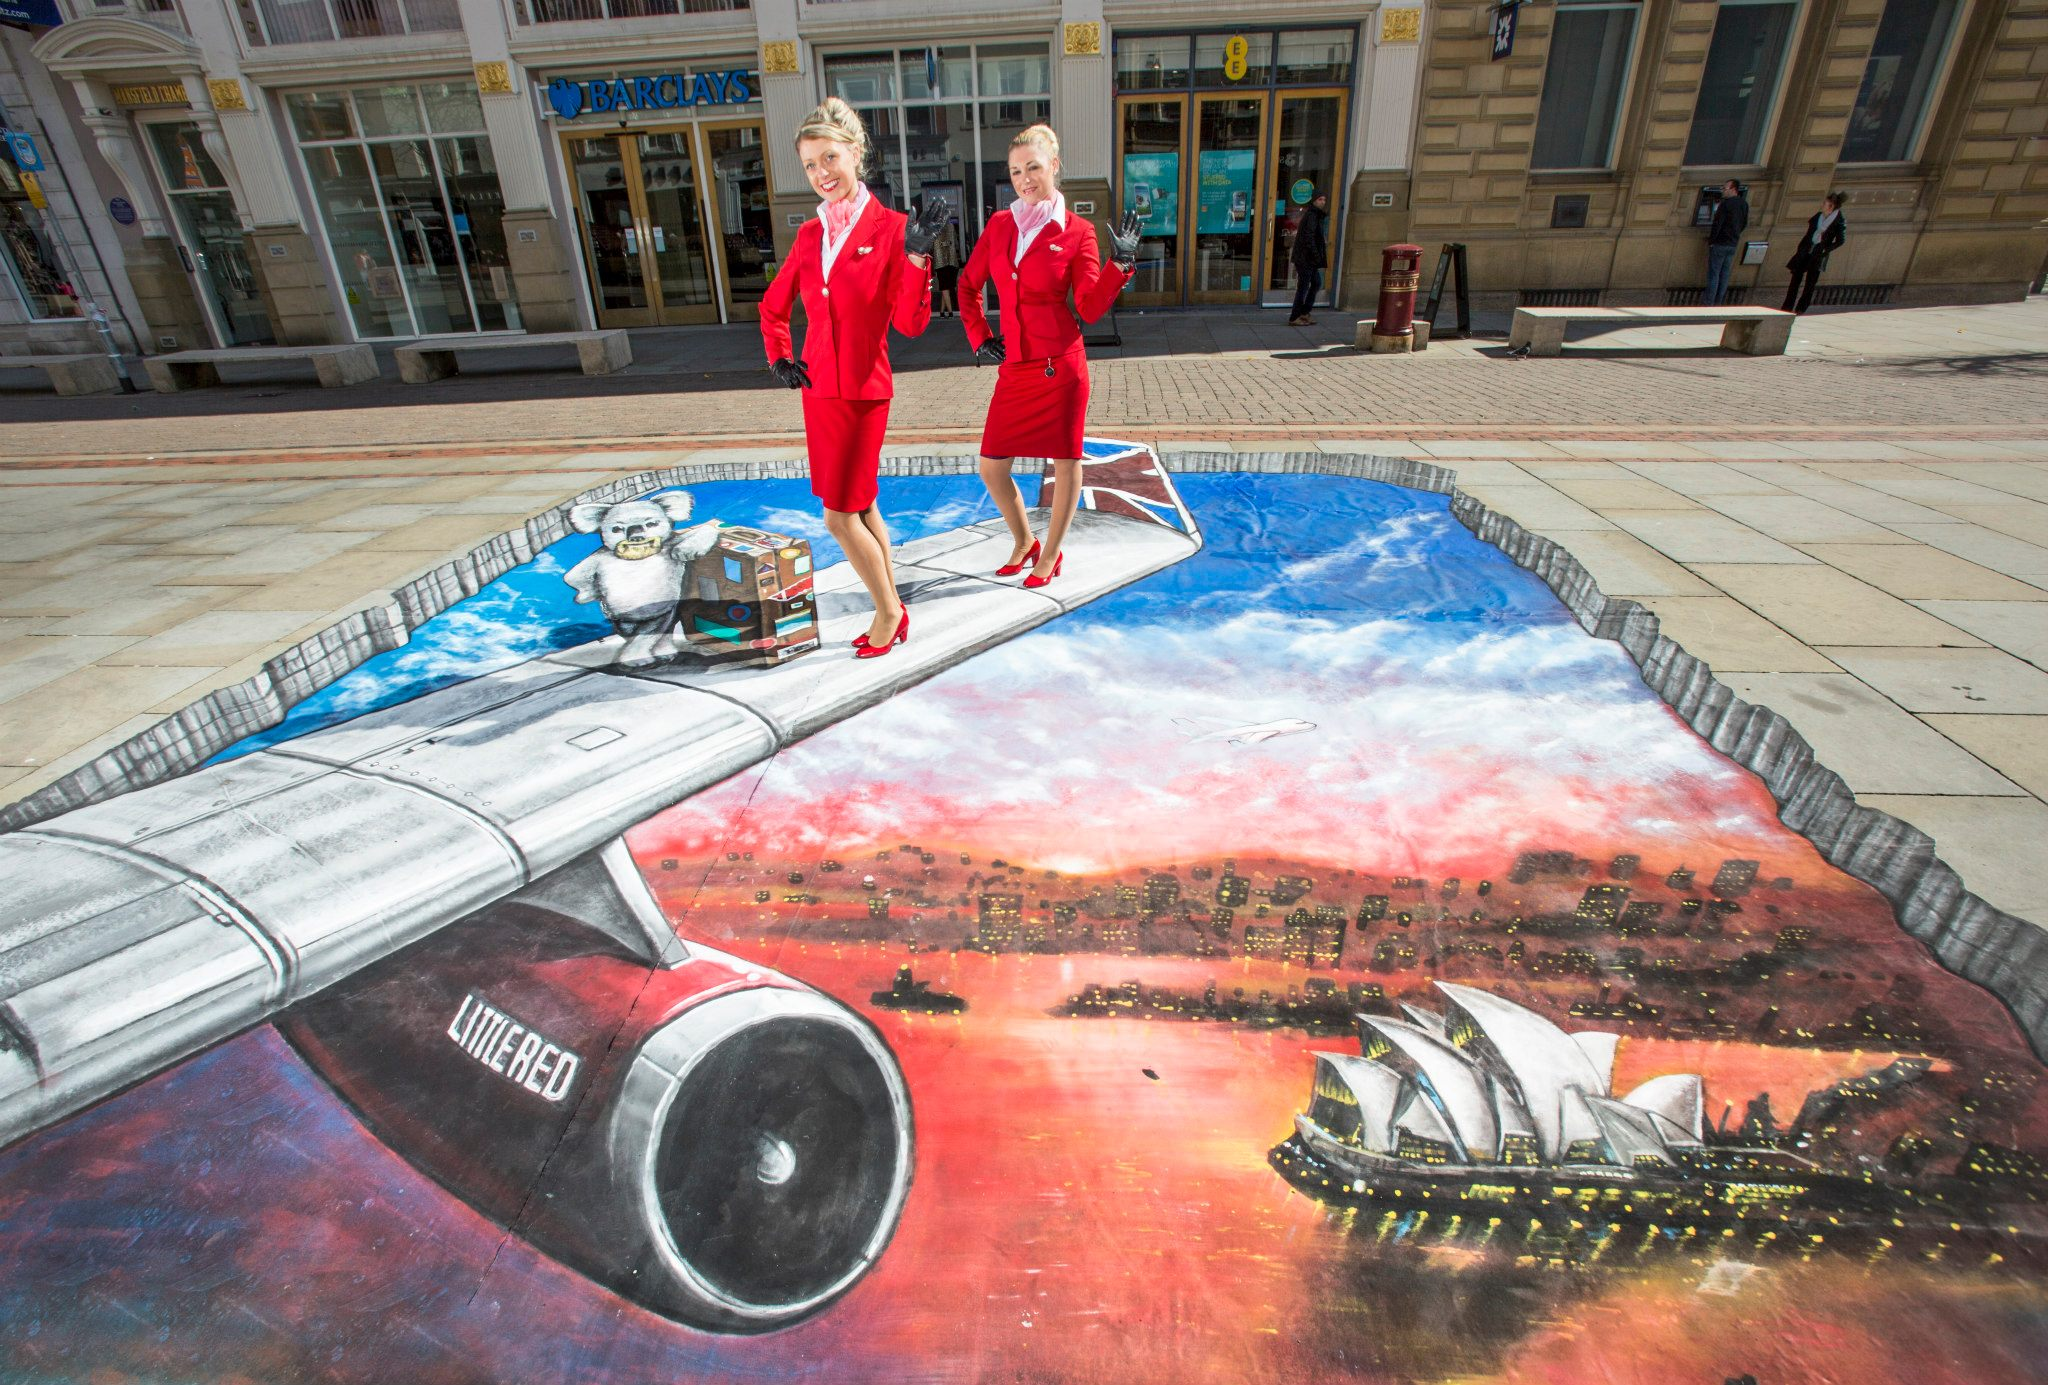 Virgin Atlantic 3D artwork at St Anns Square Manchester